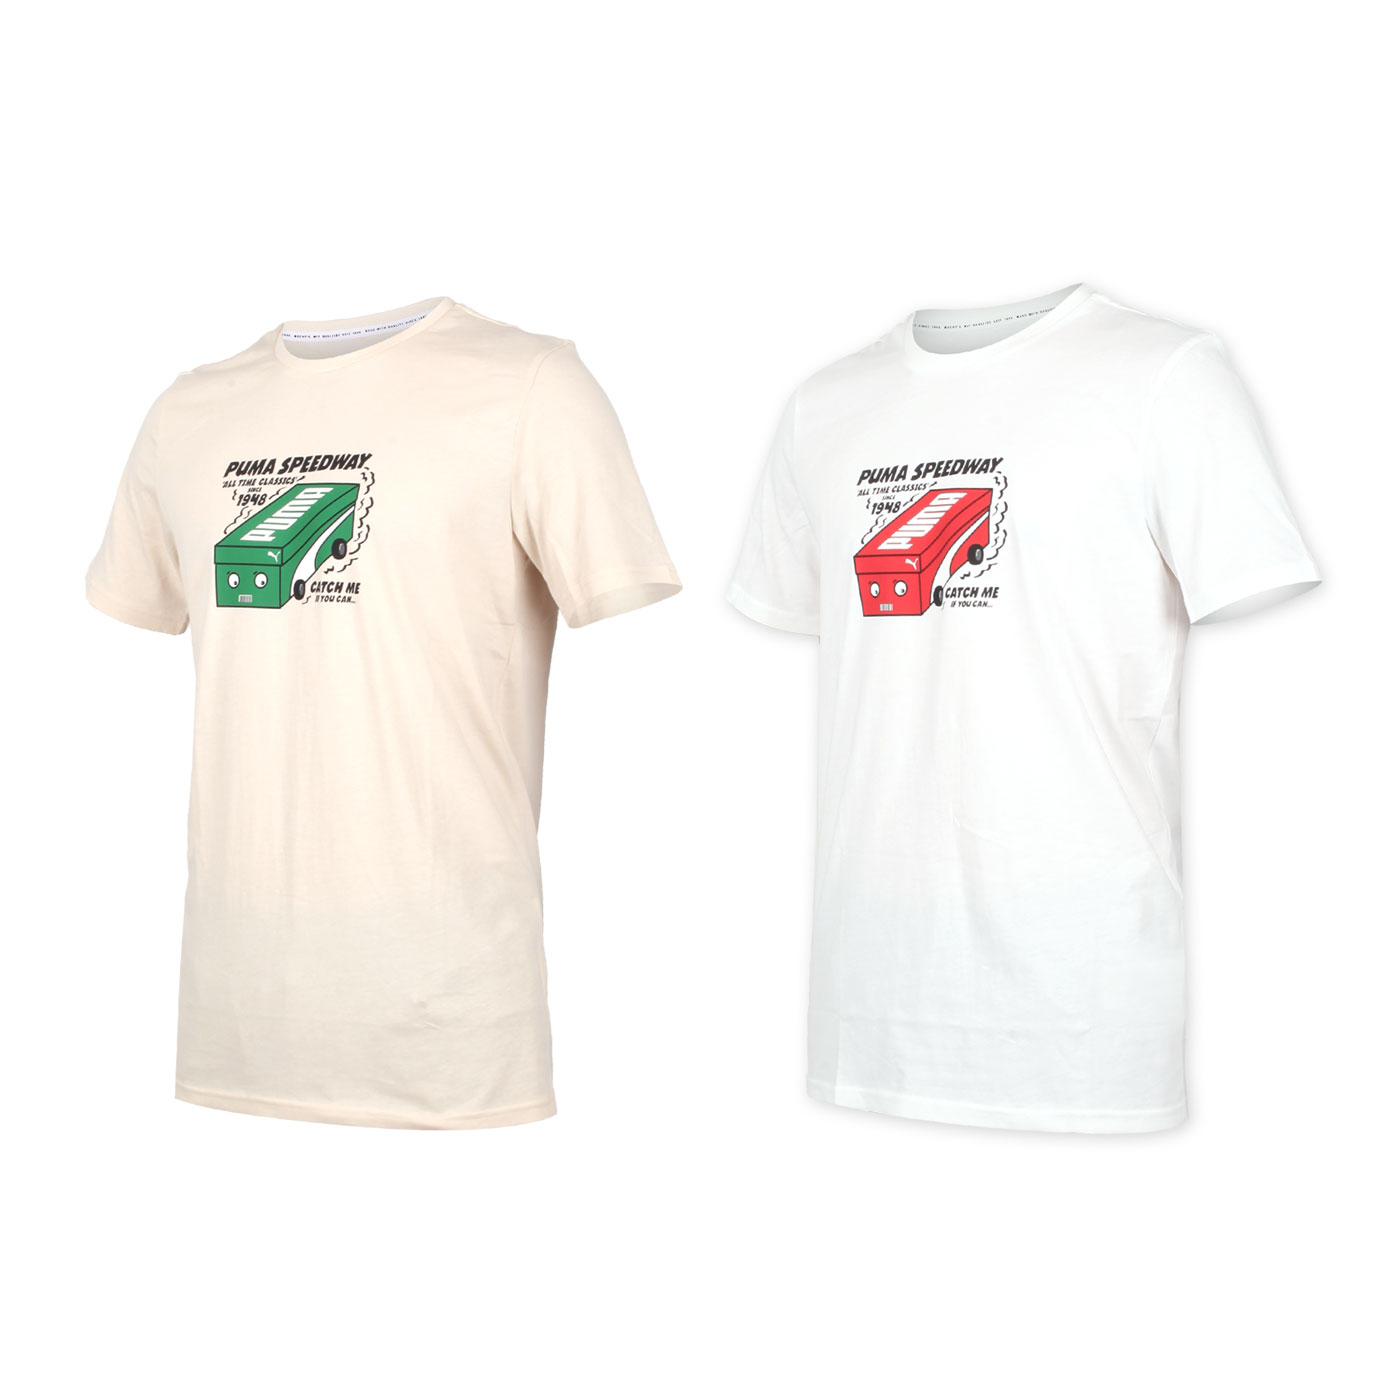 PUMA 男款流行系列短袖T恤 59862752